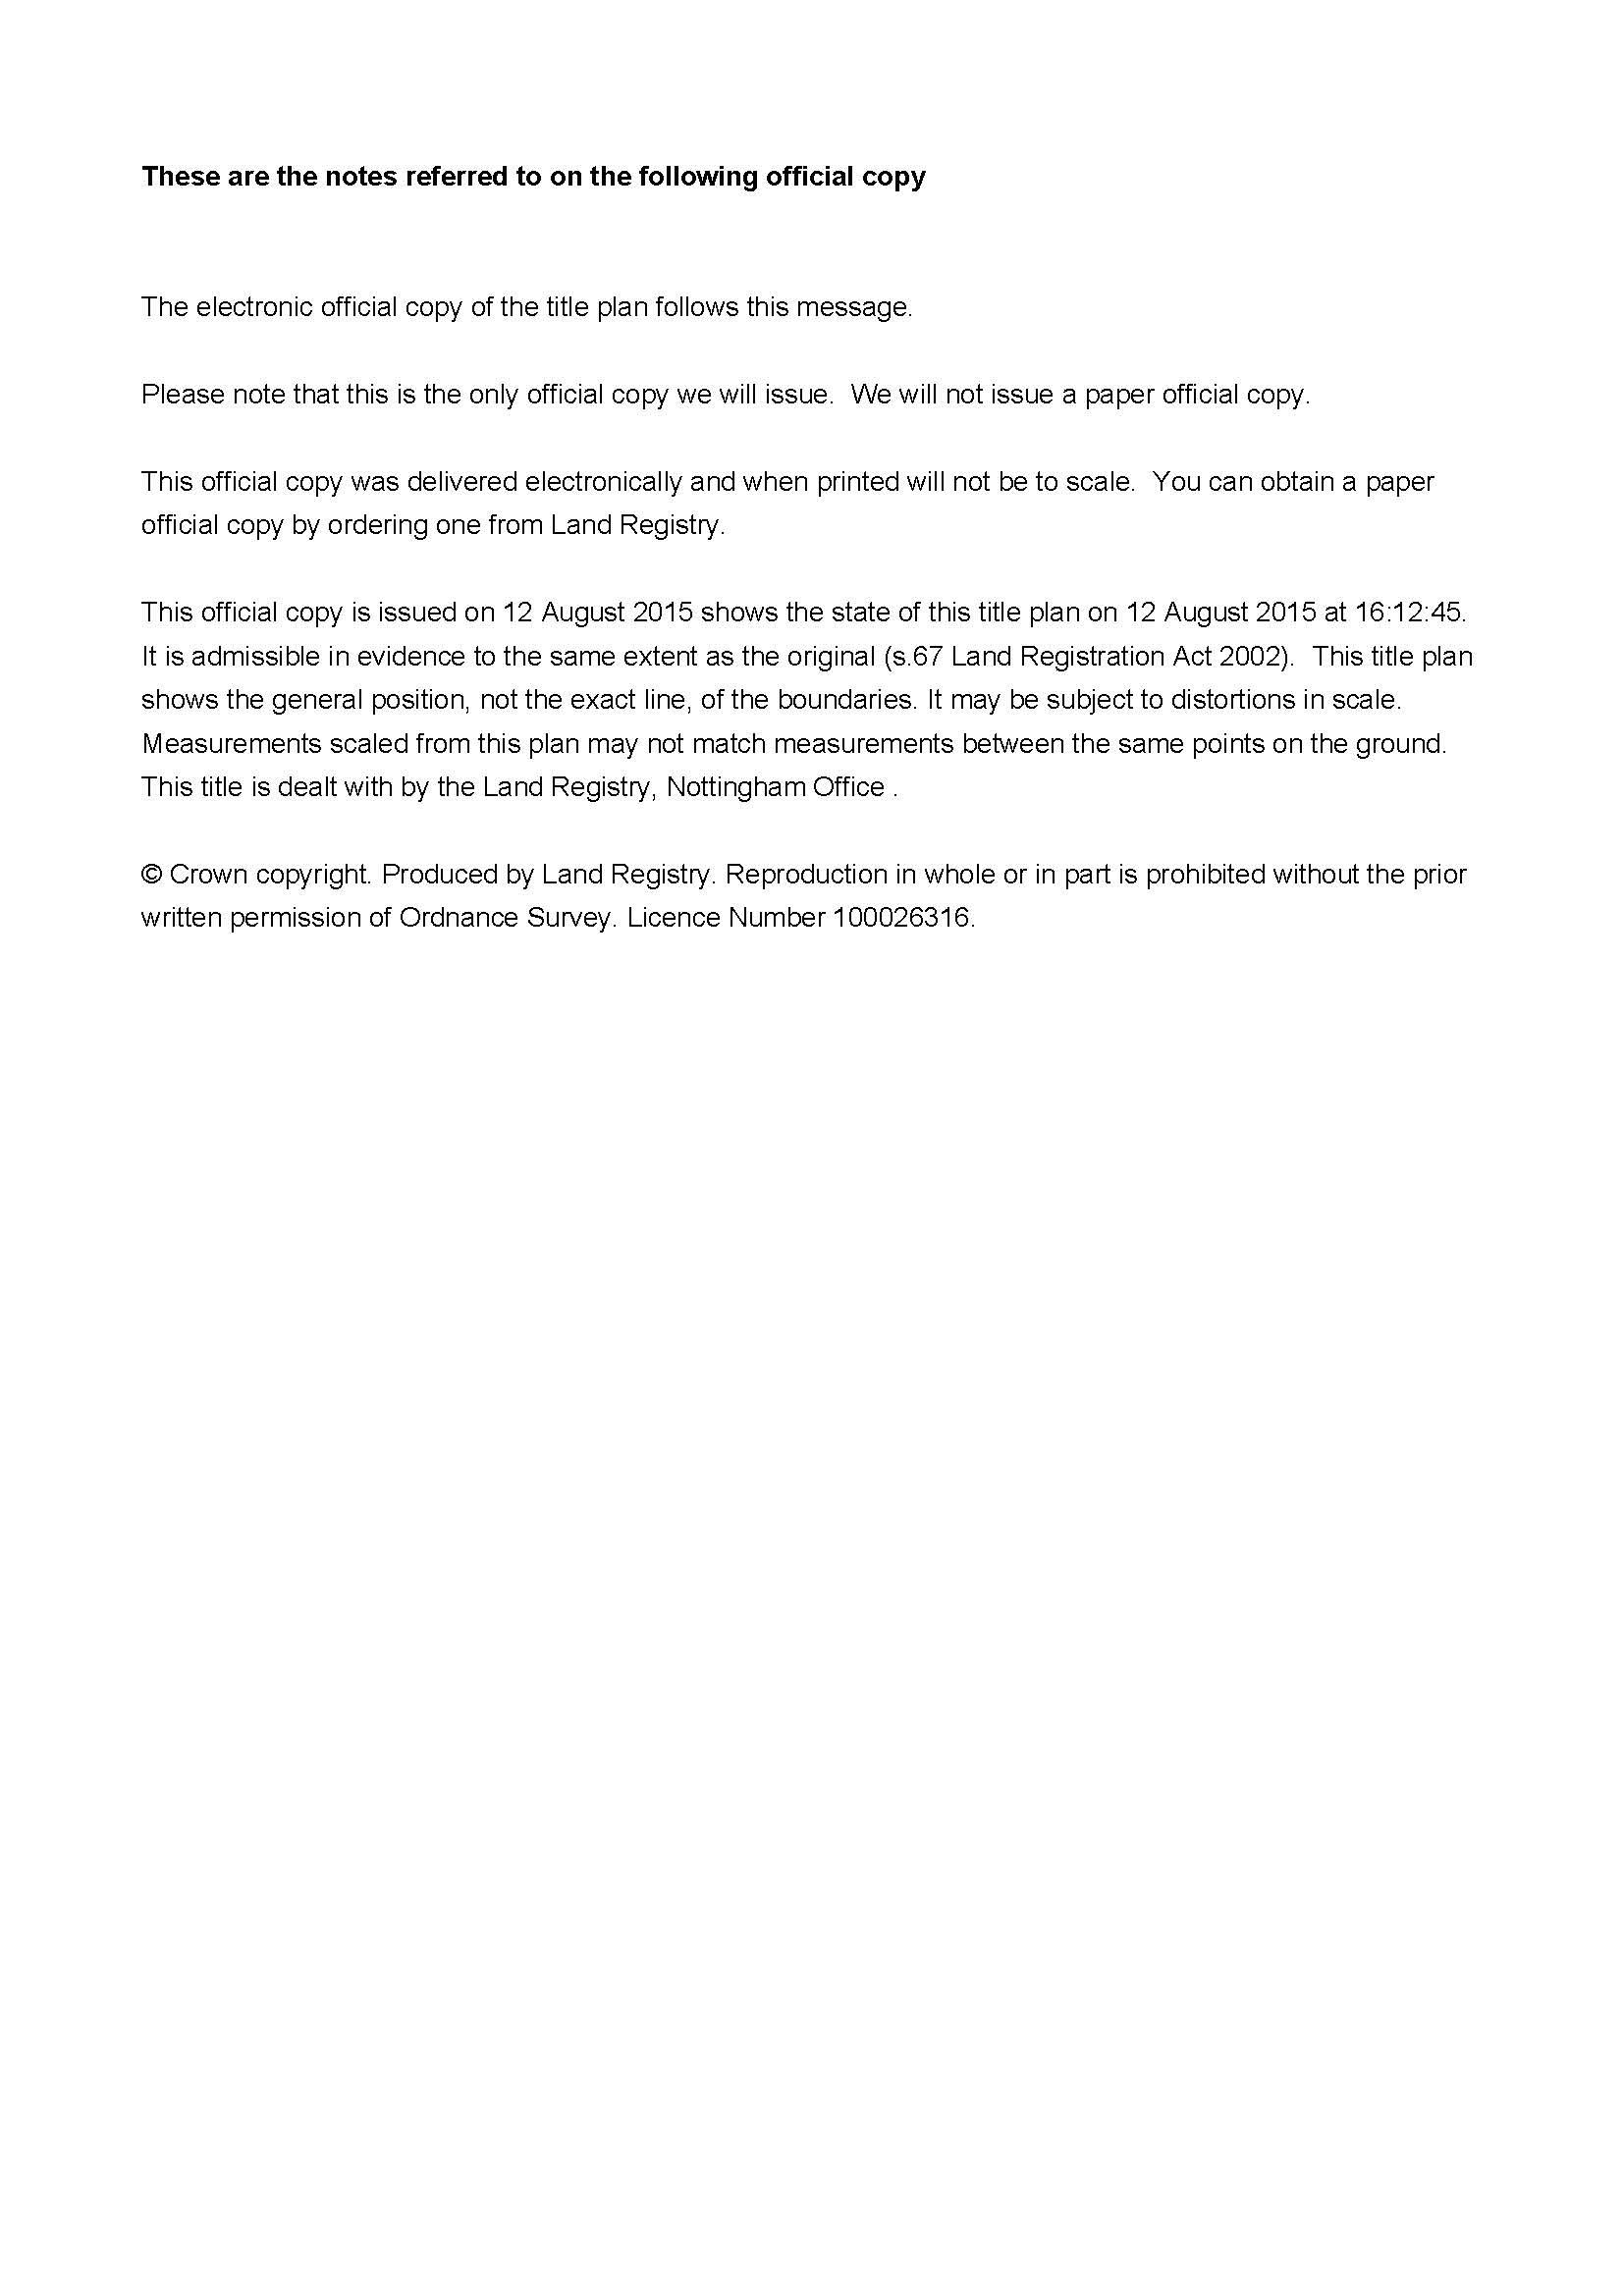 Title Plan -  K438701 - Hadlow Tower_Page_1.jpg